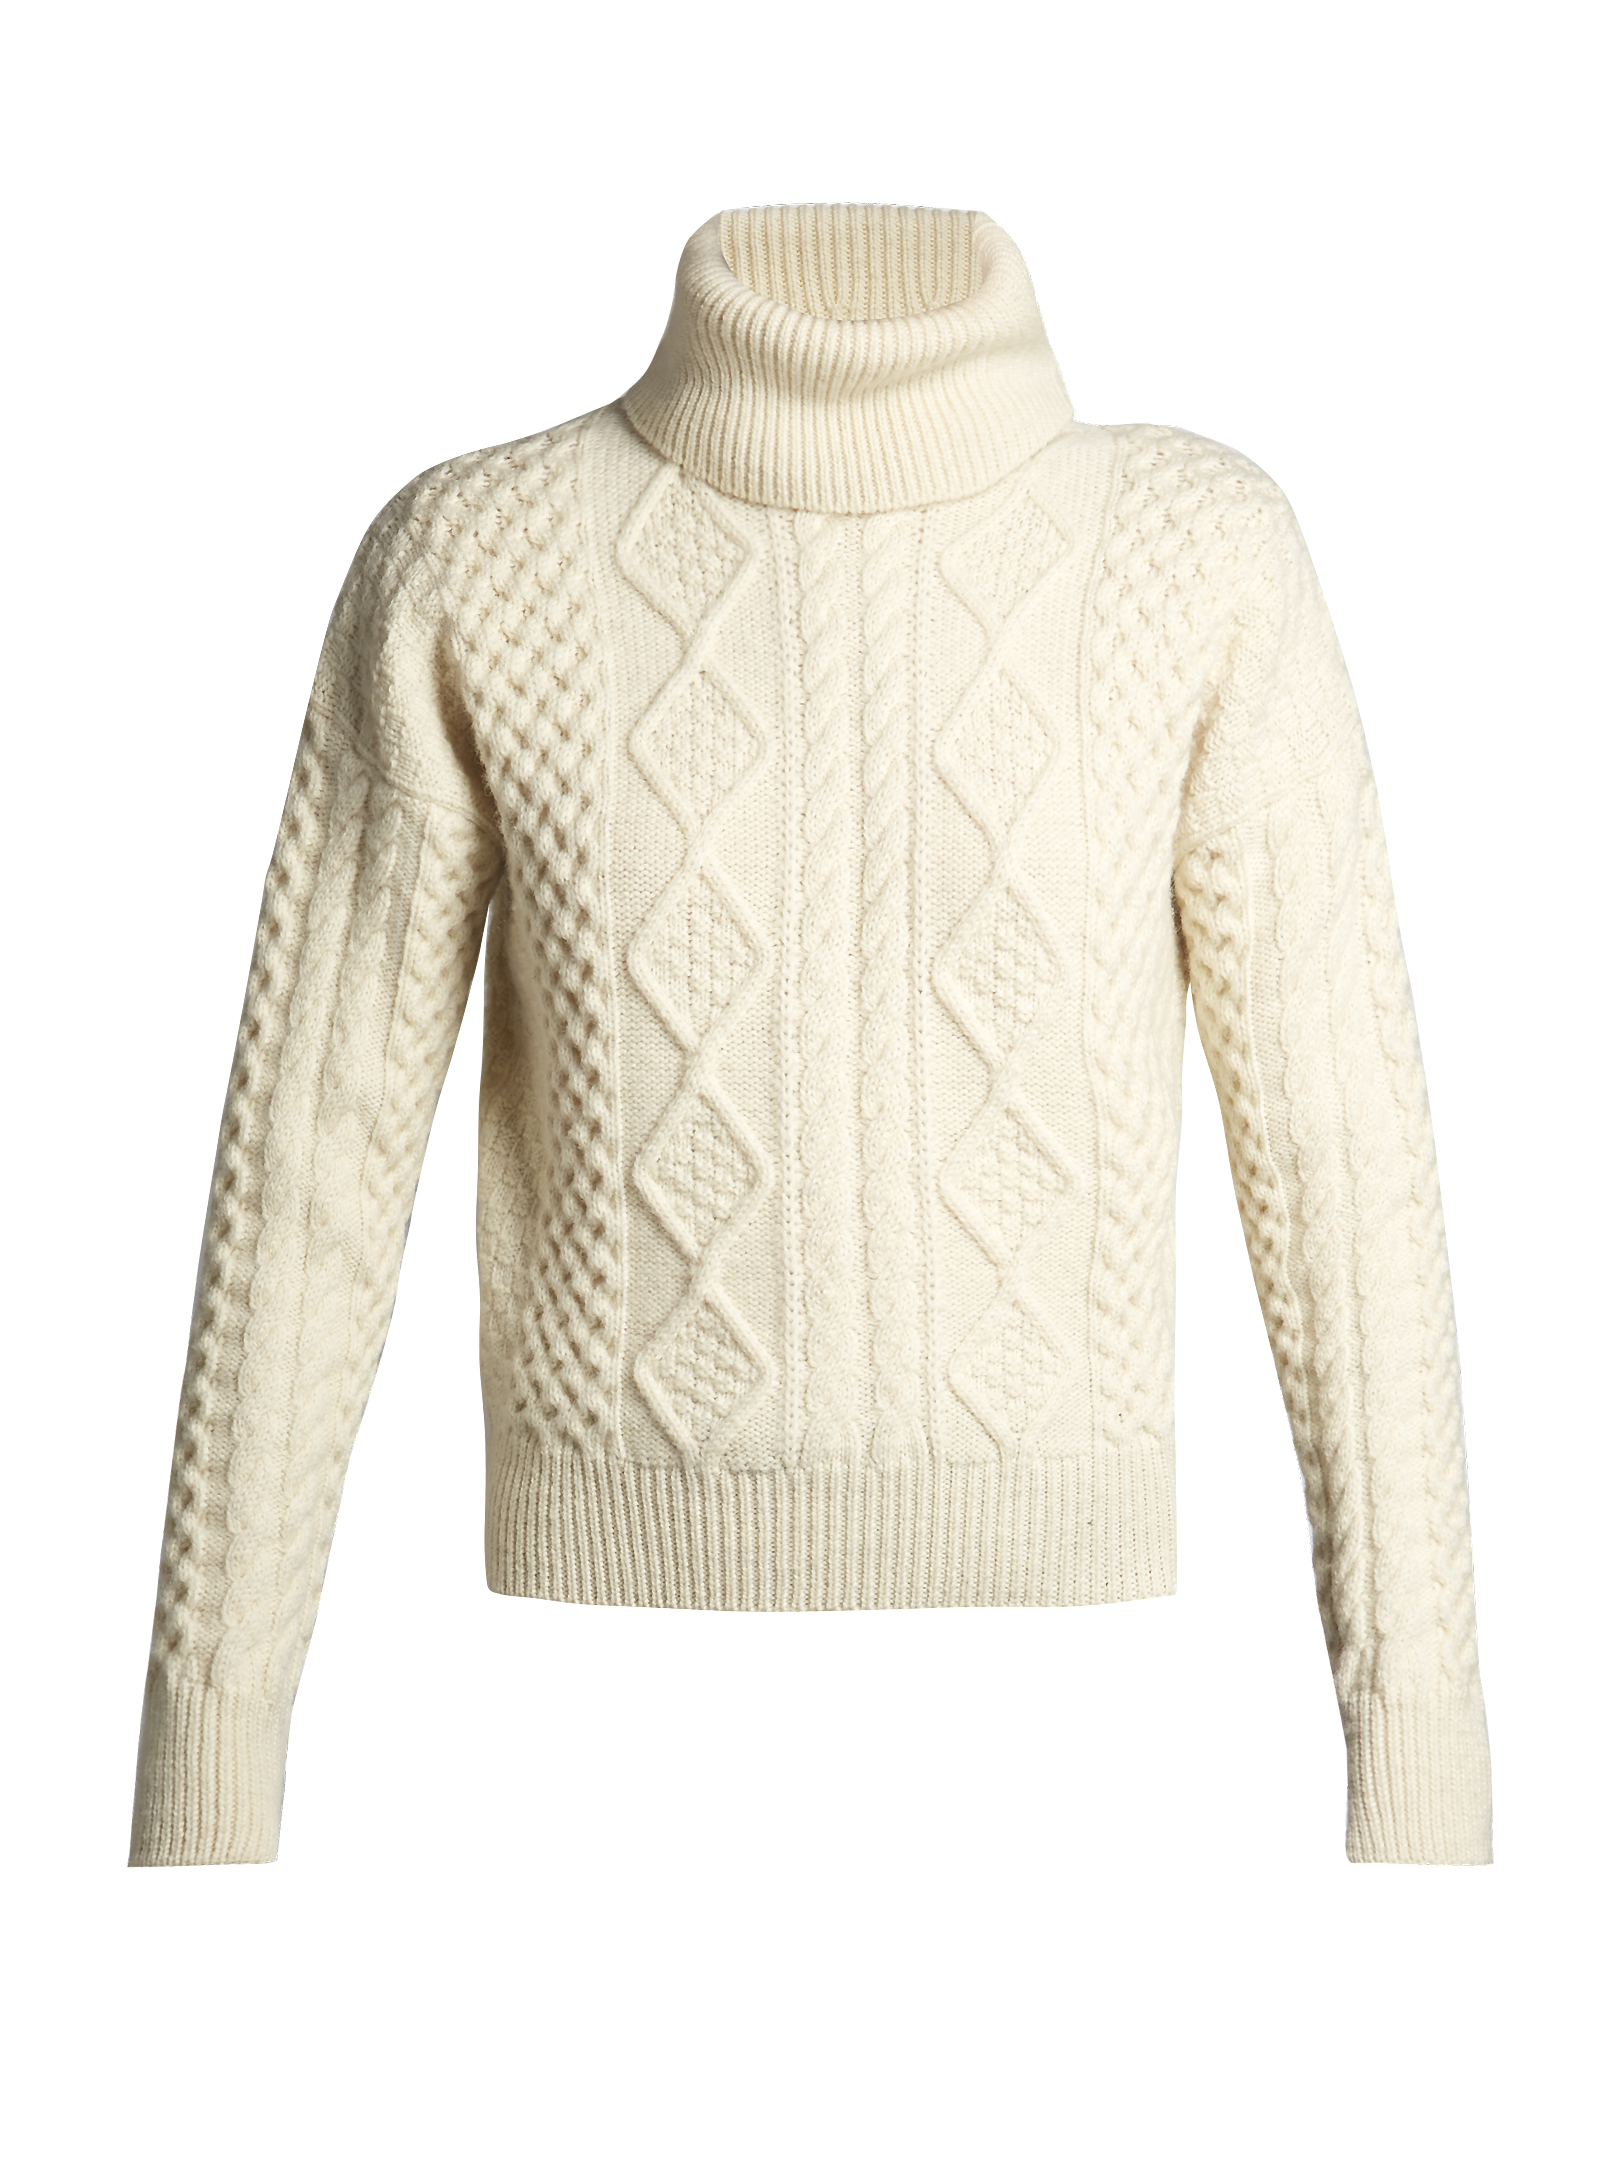 ivory cable knit - Saint Laurent / for less